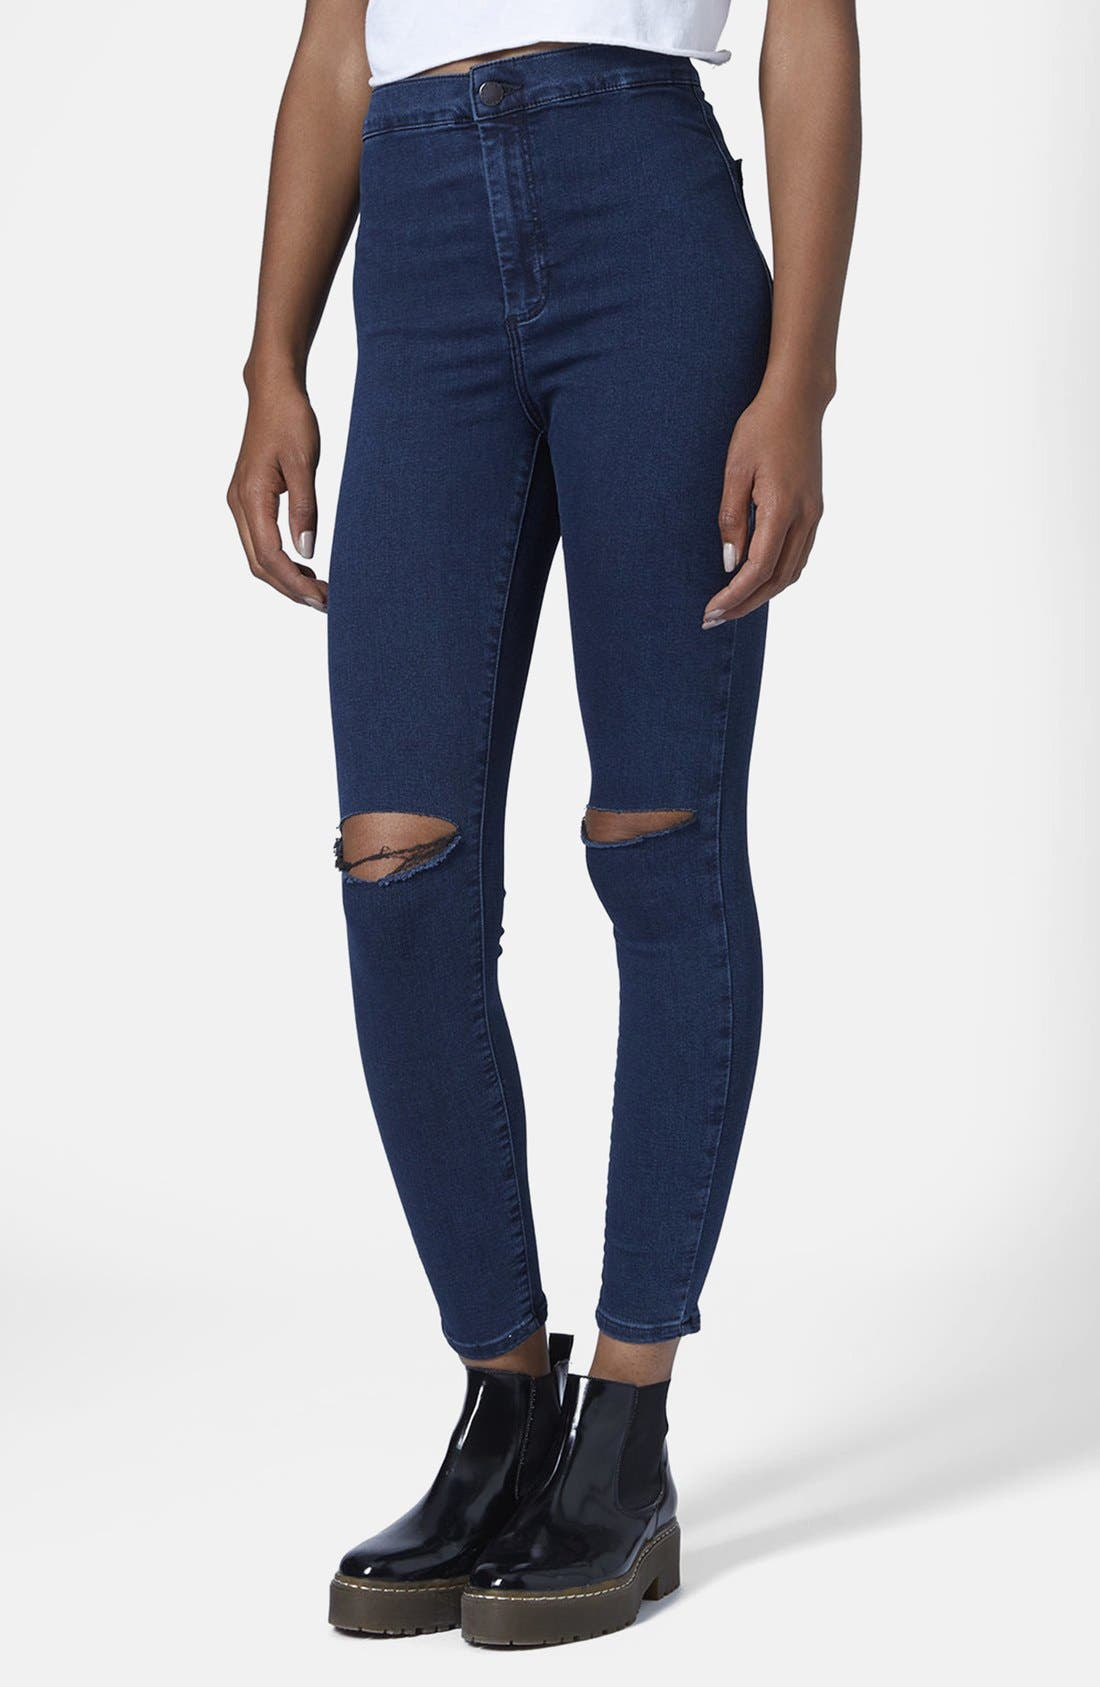 Alternate Image 1 Selected - Topshop Moto 'Joni' Ripped High Rise Skinny Jeans (Blue) (Petite)